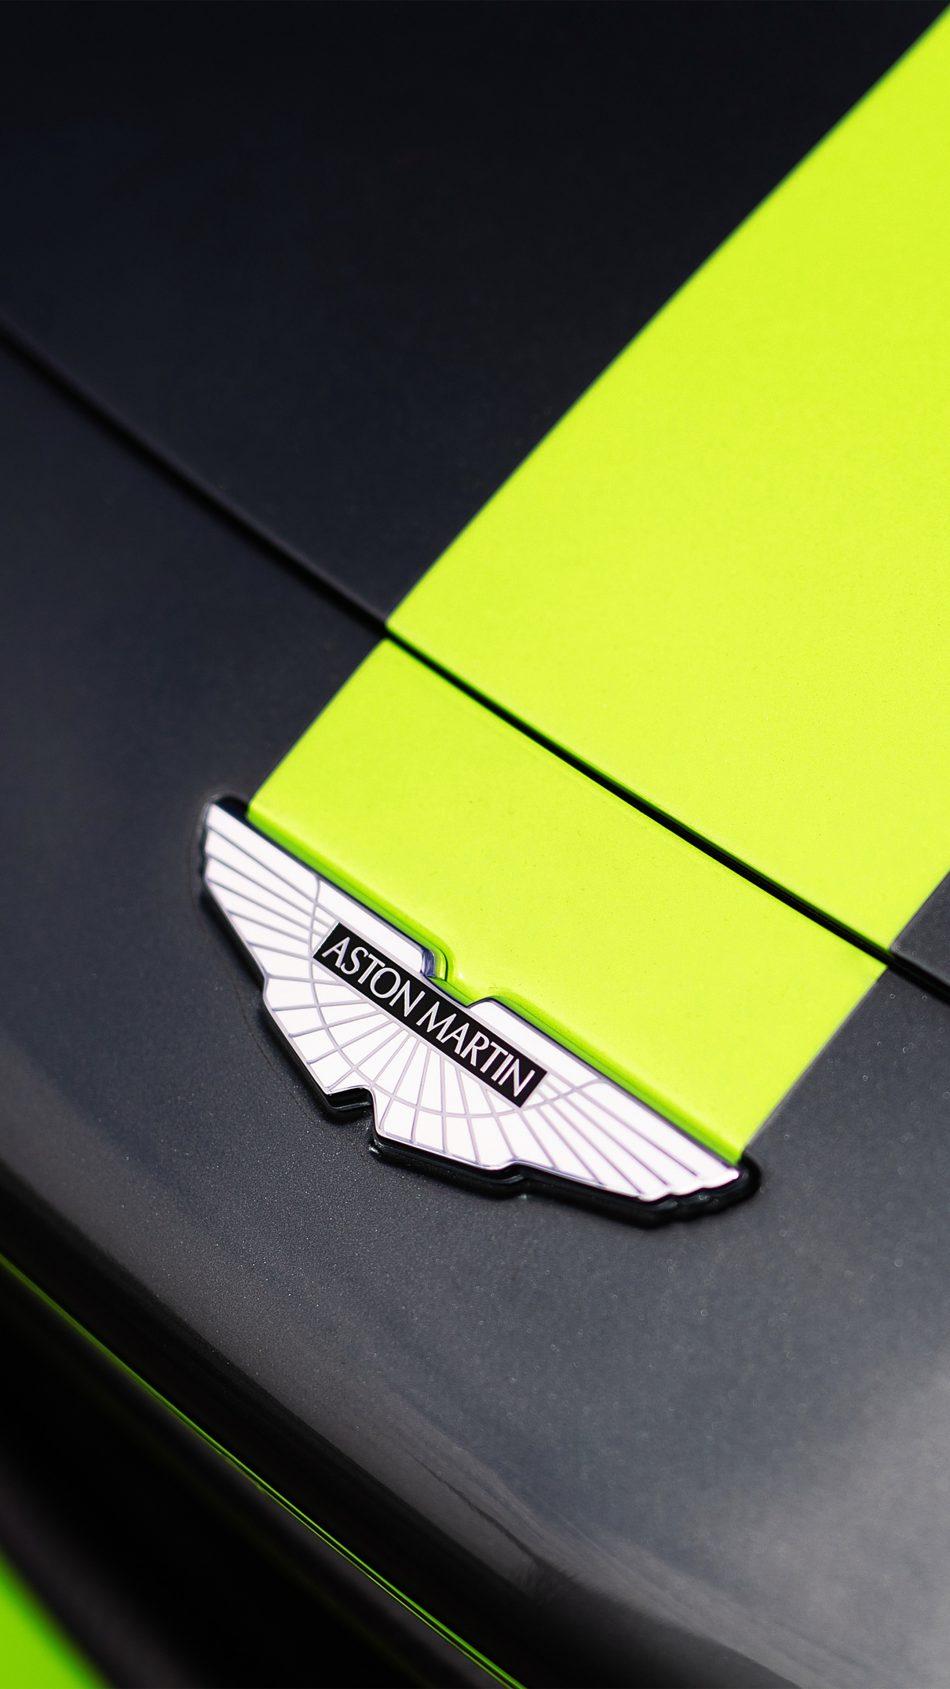 Aston Martin Logo 4K Ultra HD Mobile Wallpaper